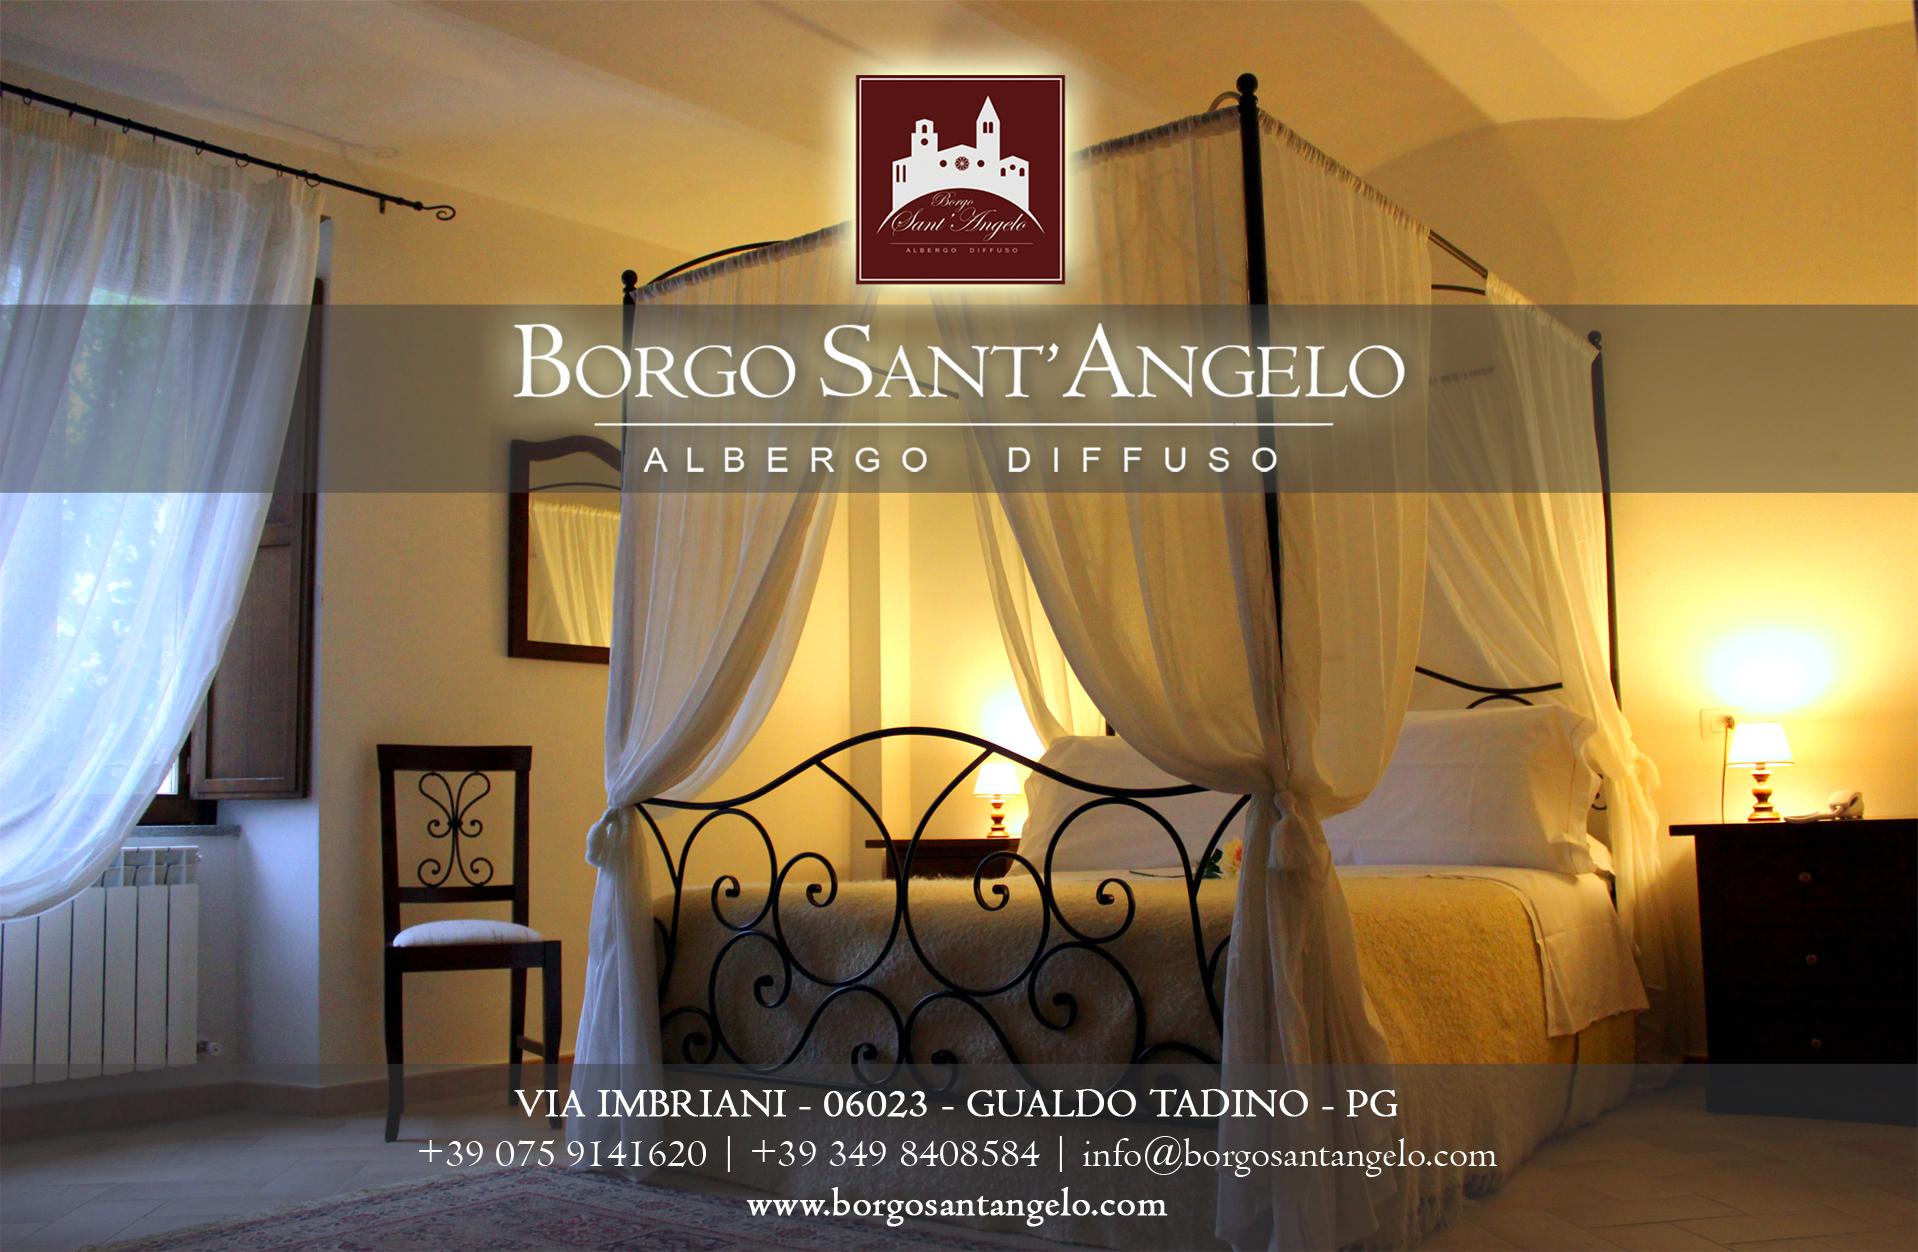 BORGO SANT'ANGELO ALBERGO DIFFUSO - Via Imbriani - GUALDO TADINO (Pg)Tel. +39 075.9141620 Mob. +39 349.8408584www.borgosantangelo.com info@borgosantangelo.com